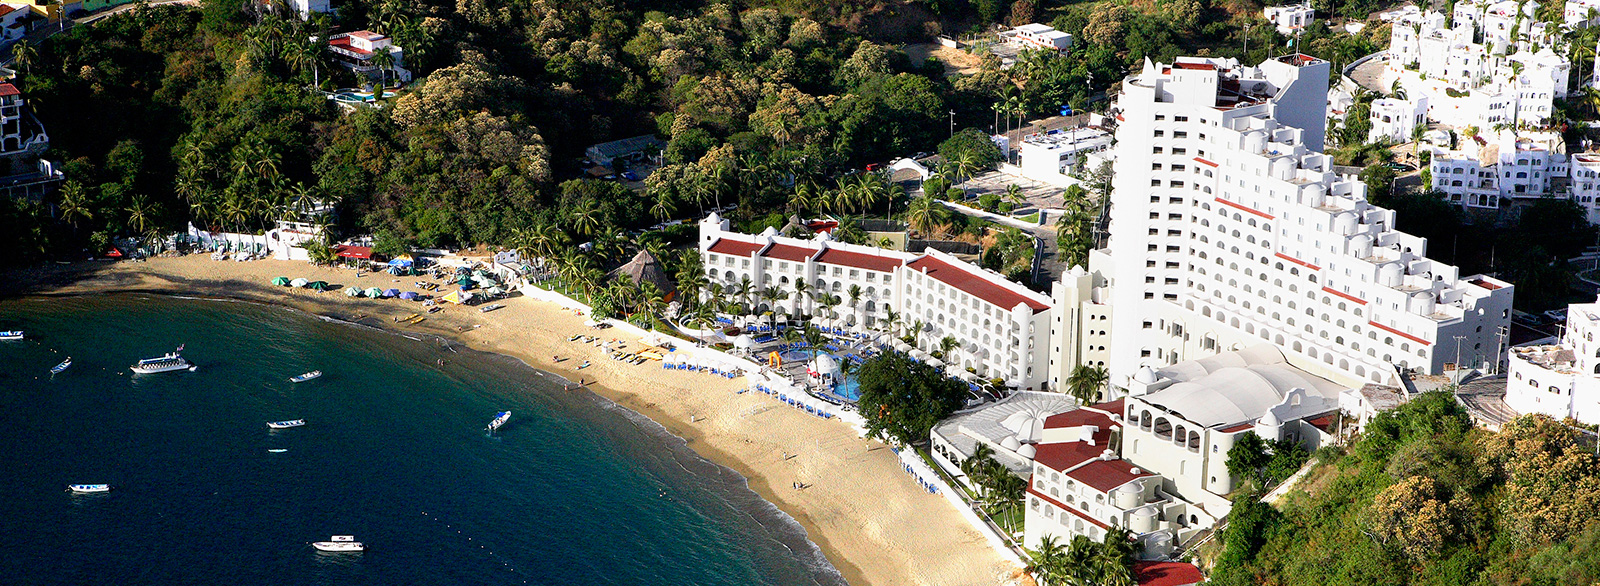 https://imacoponline.com/1-sistema/galeria/panoramicas/9416956614369779885Panoramica-Hotel-portada.jpg